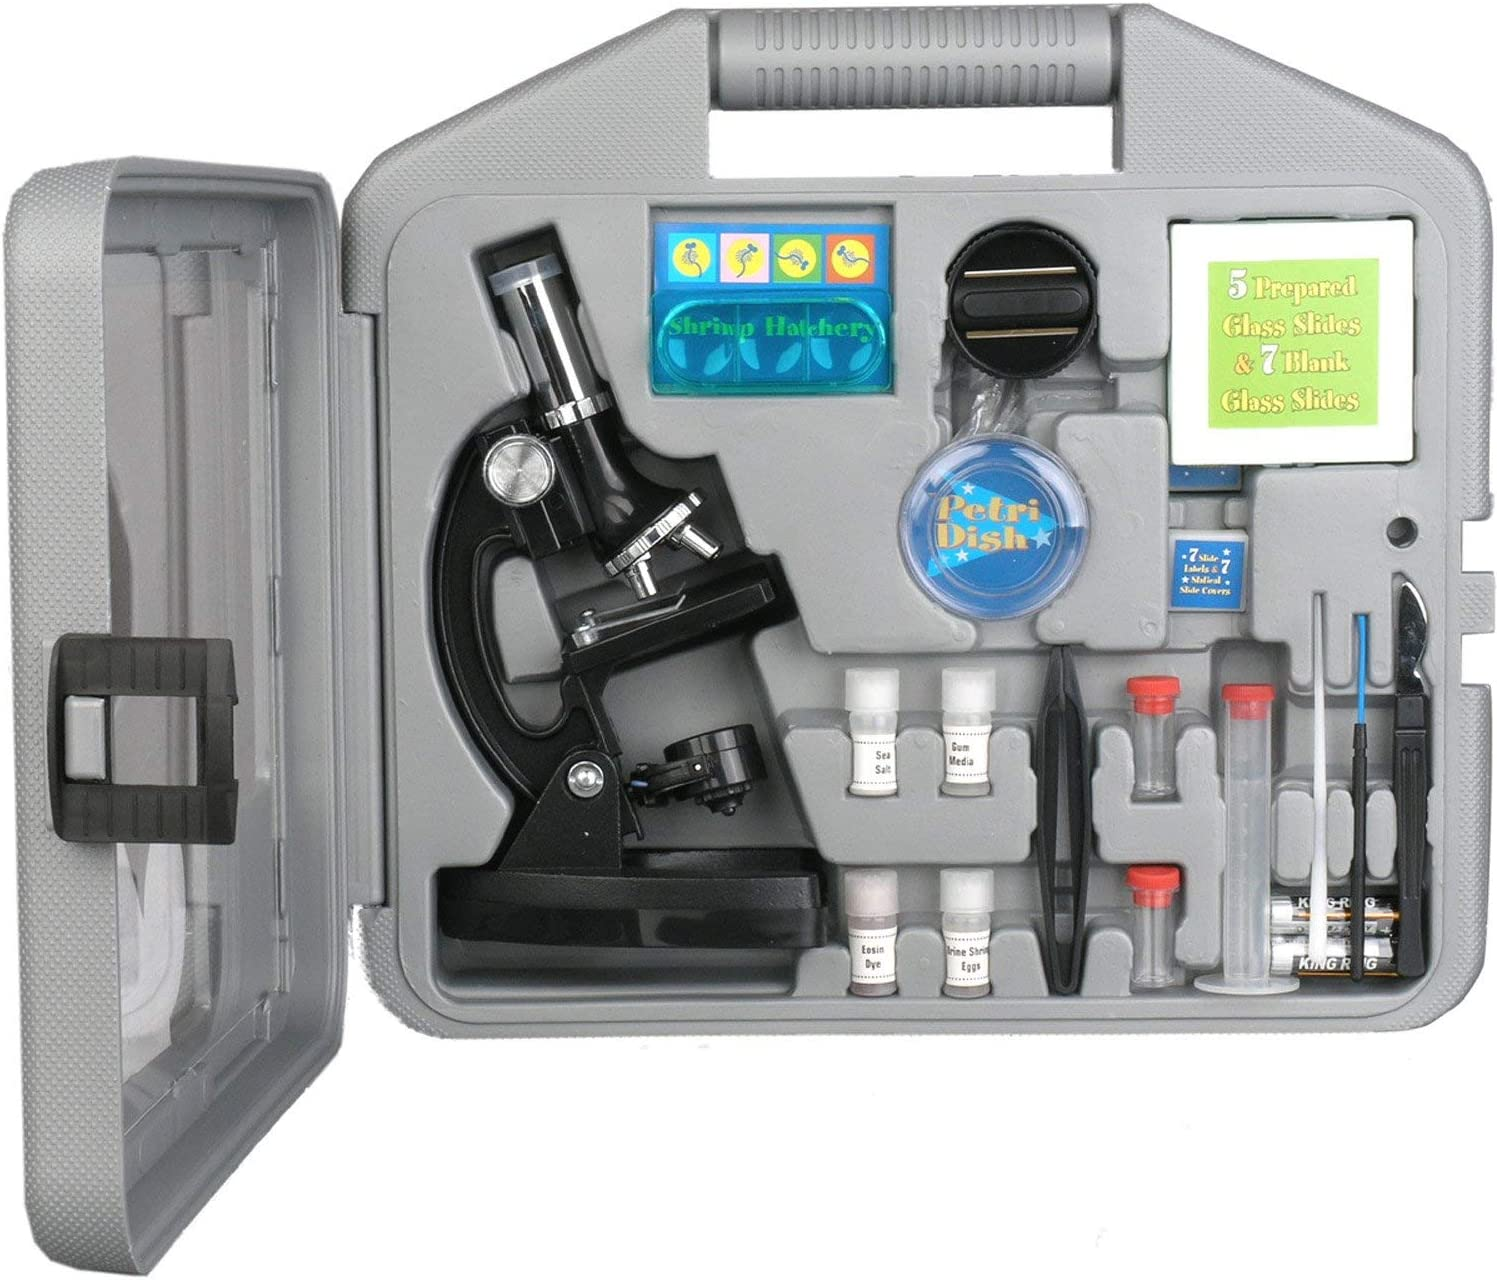 Kit de microscopio M30-ABS-KT2 para niños de AmScope-KIDS, de 120X-240X-300X-480X-600X-1200X, brazo metálico, biología